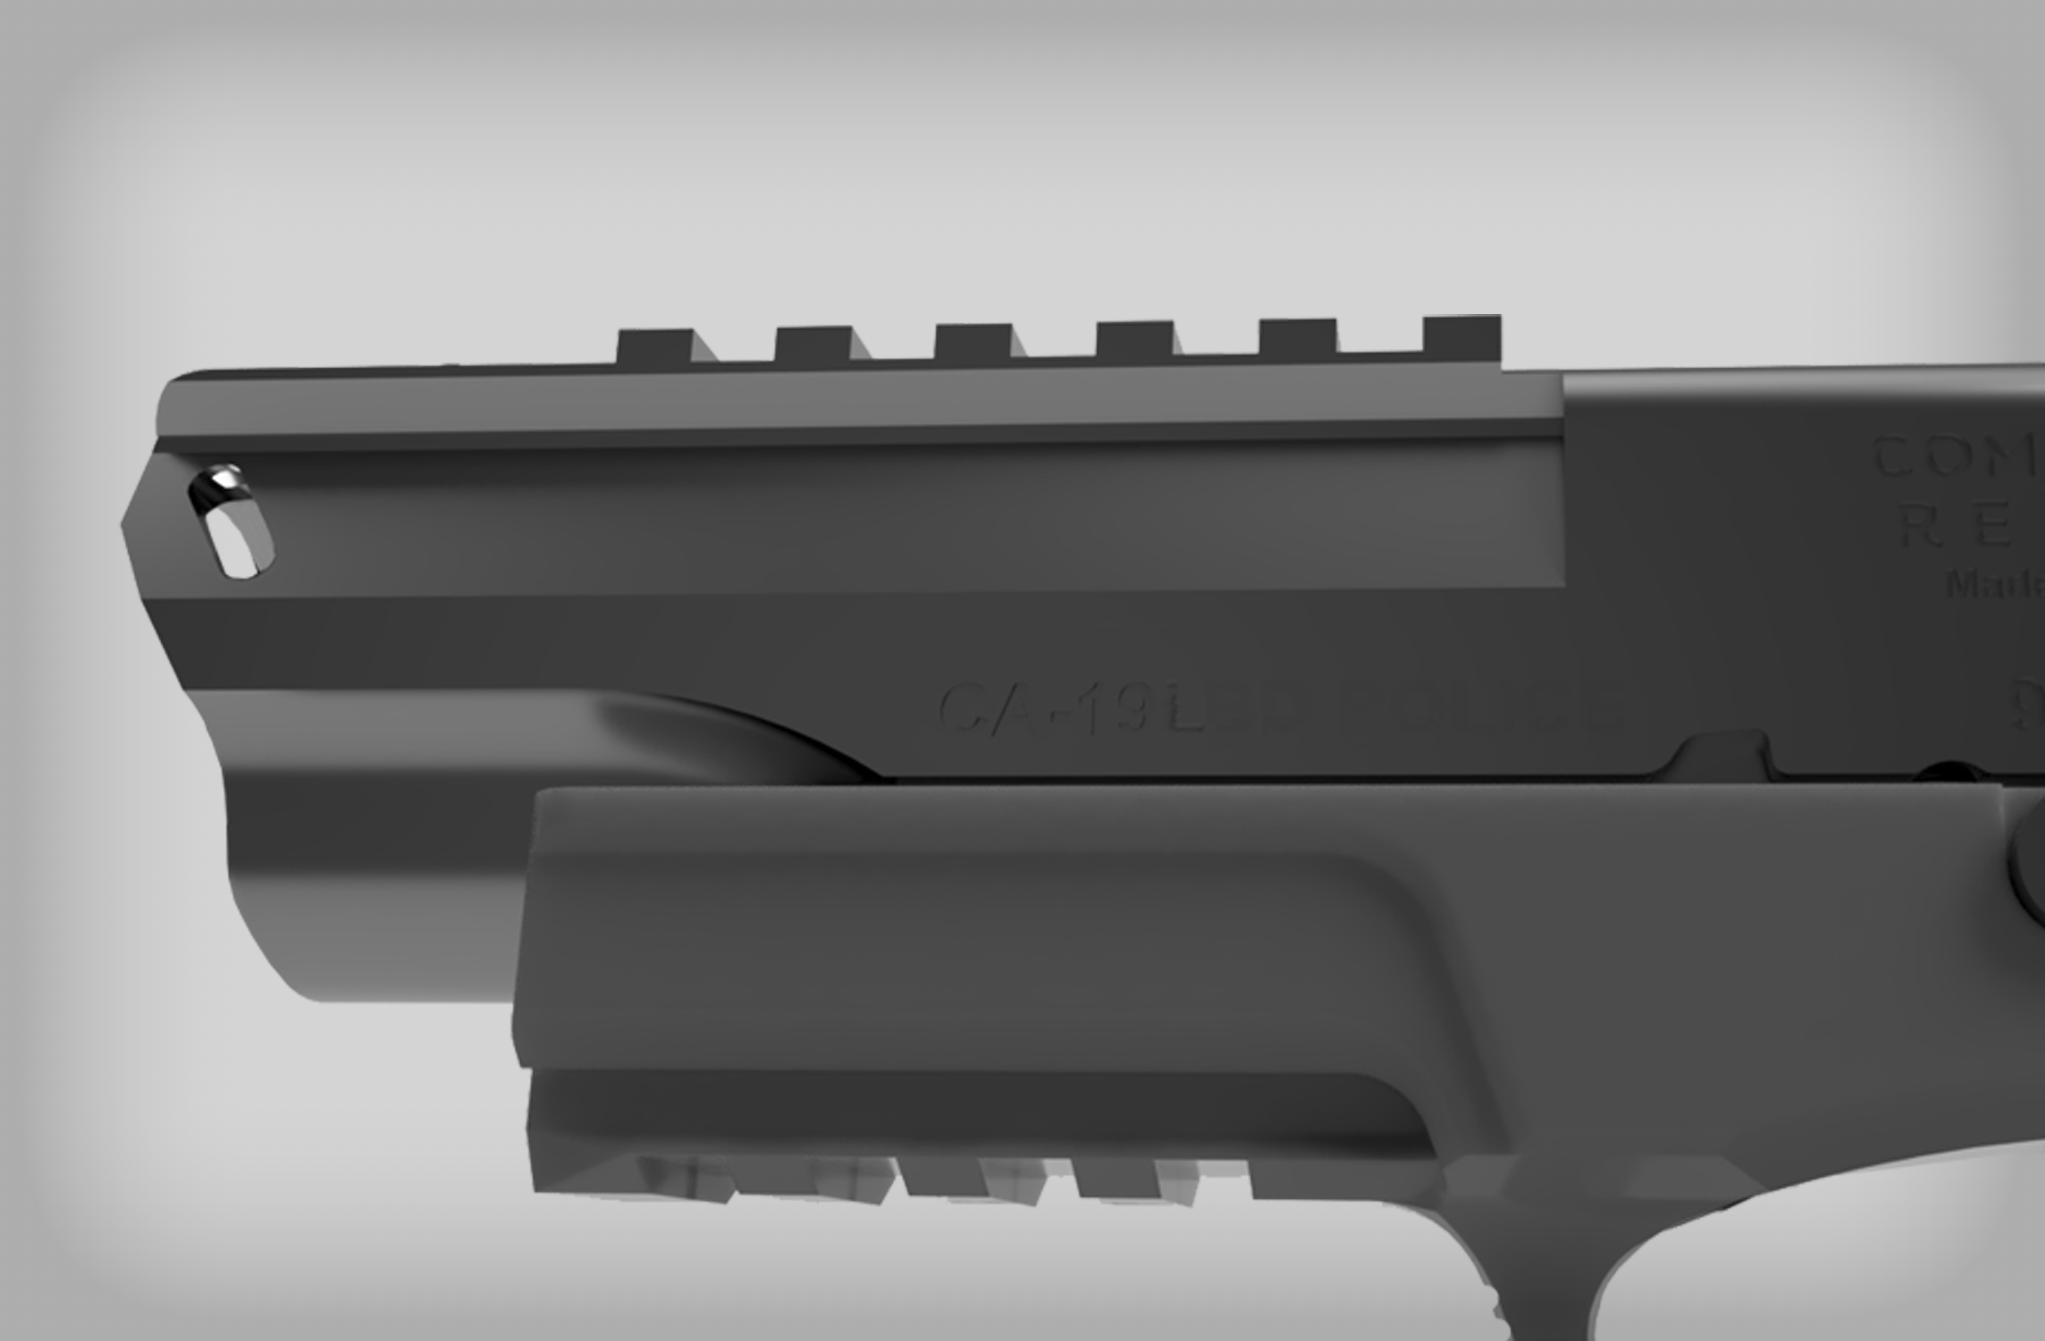 CA-19L-Hybrid-close-up-rails-muzzle-brake.png